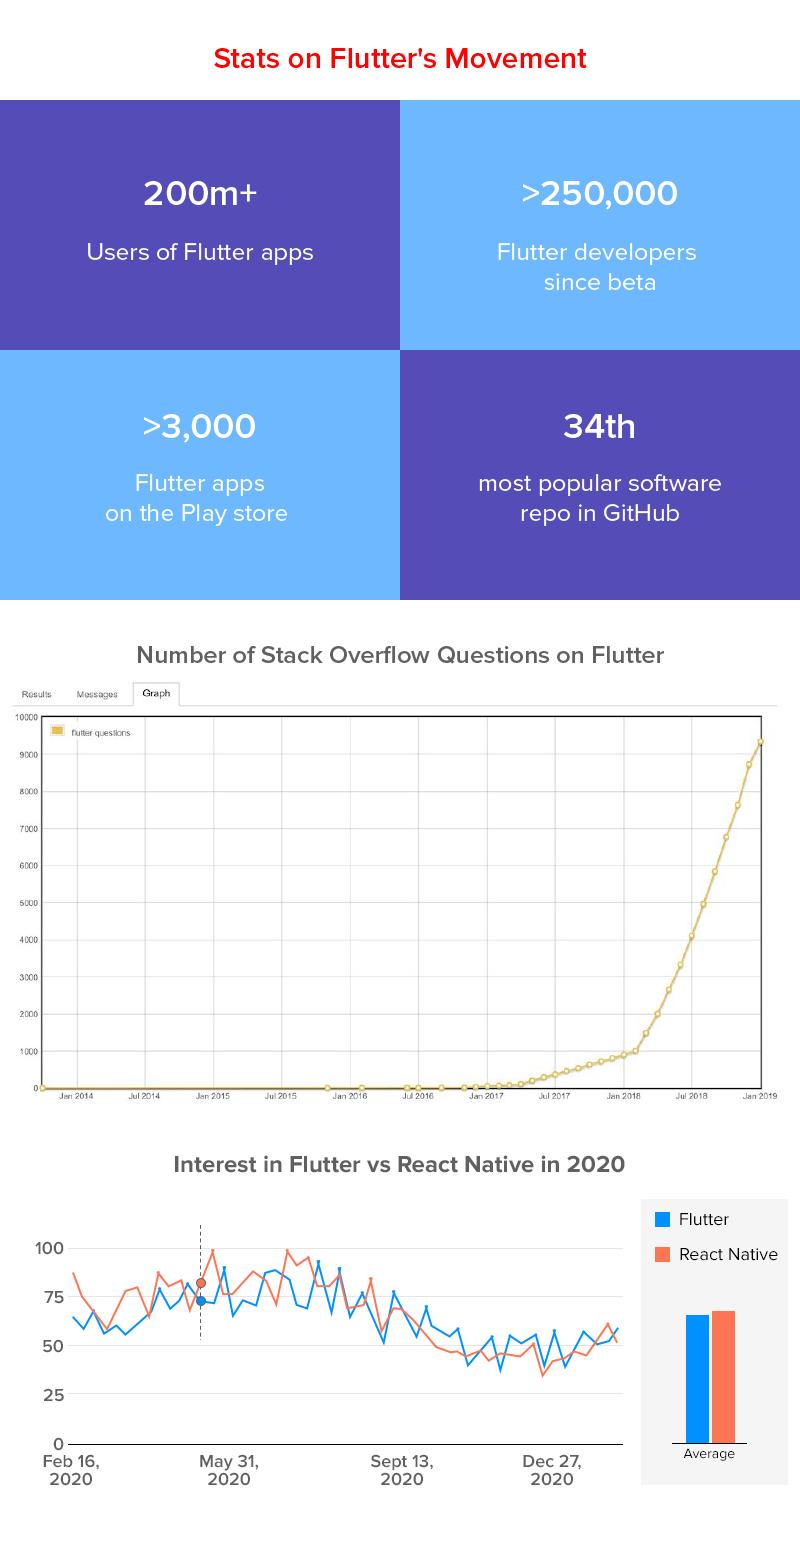 Stats of Flutter Movement